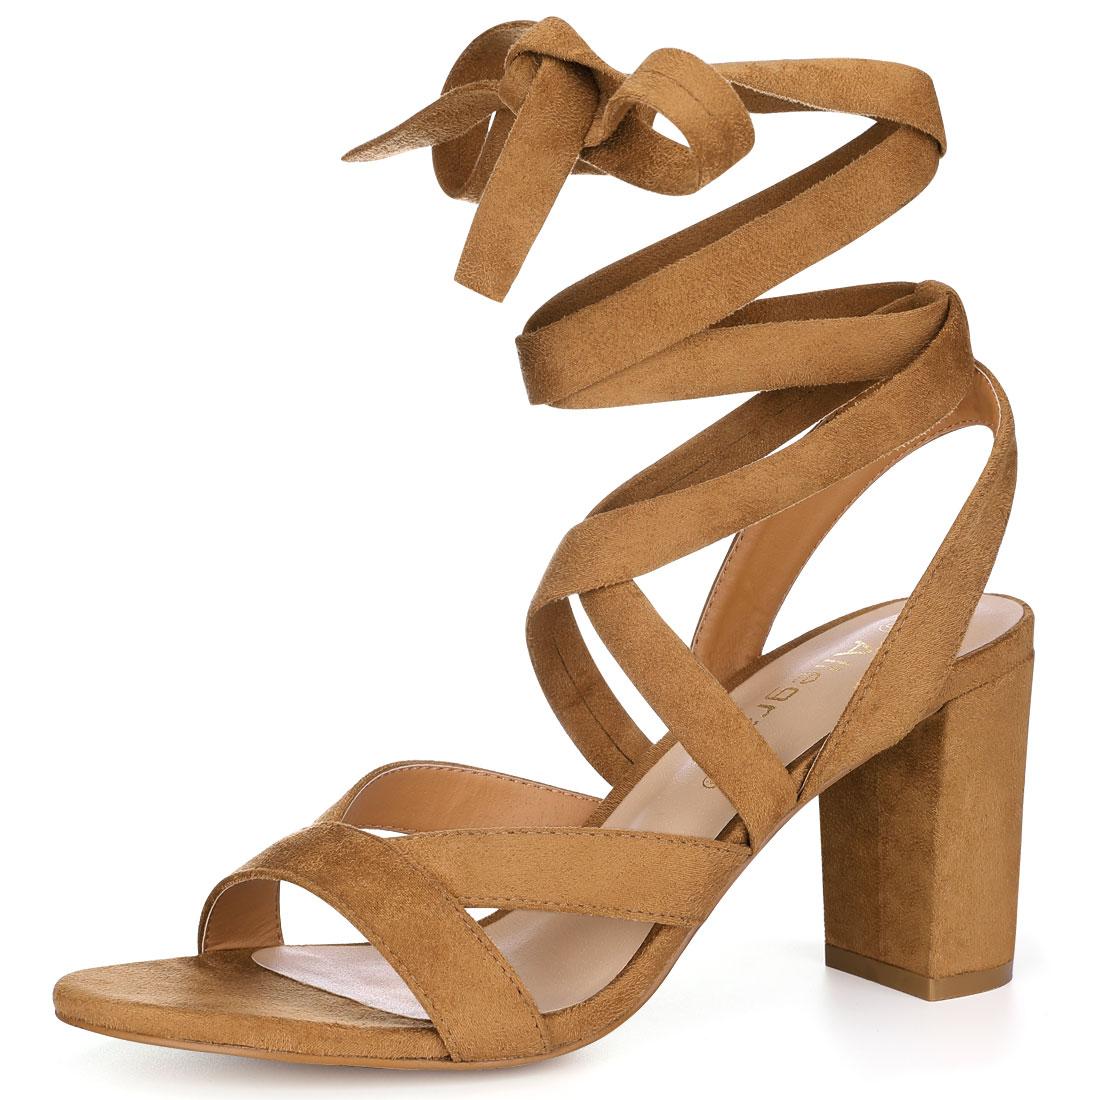 Allegra K Women Crisscross Lace Up Chunky Heel Sandals Brown US 6